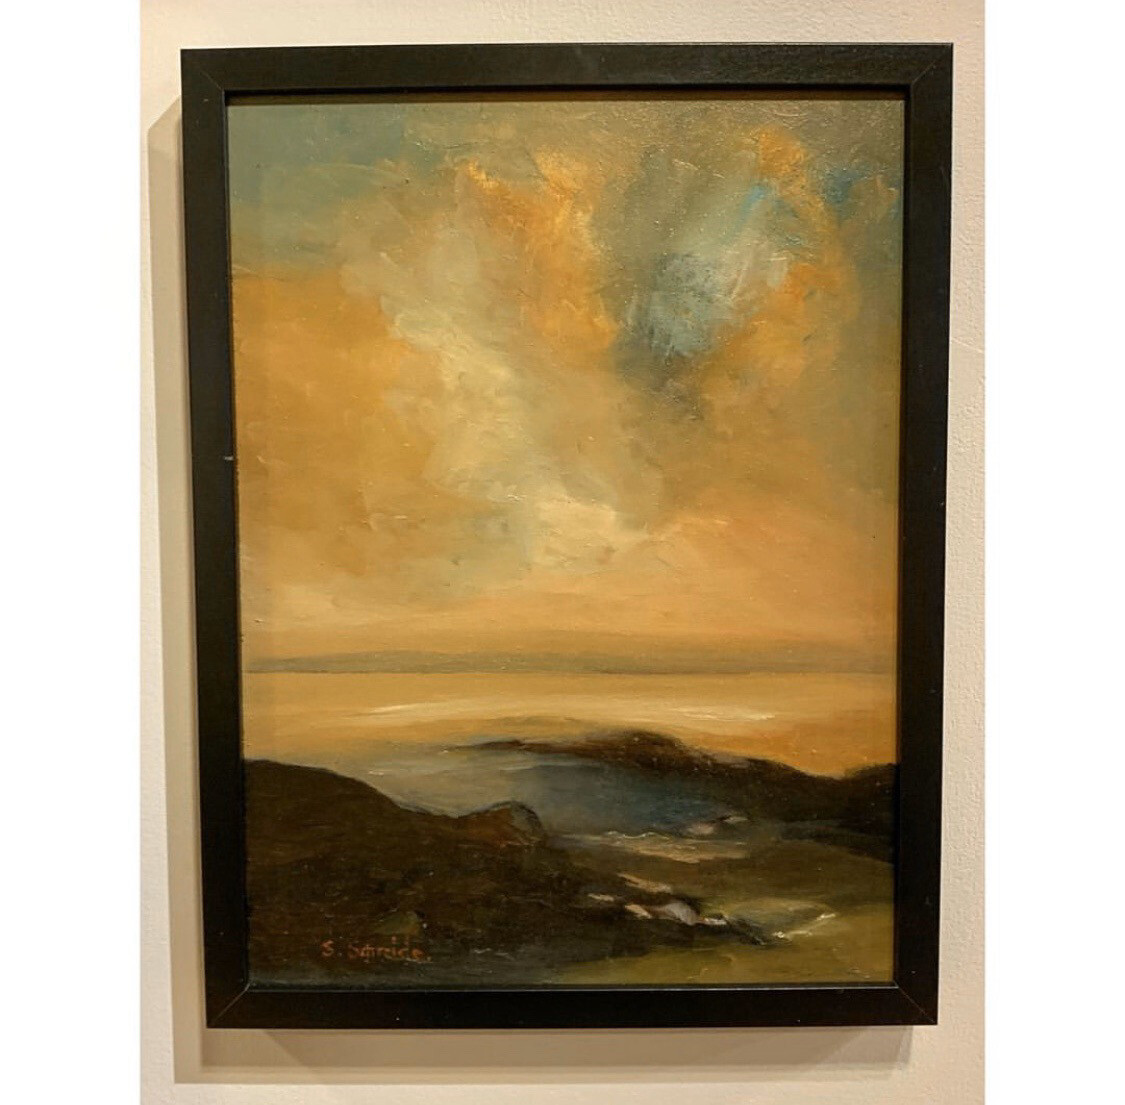 "Sigurd Søreide ""Abstrakt Landskap"""